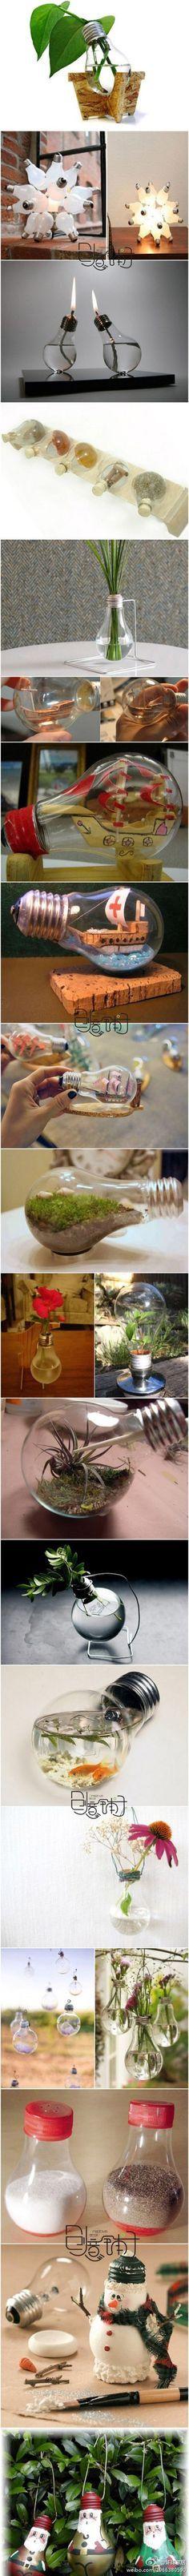 Light bulb crafts